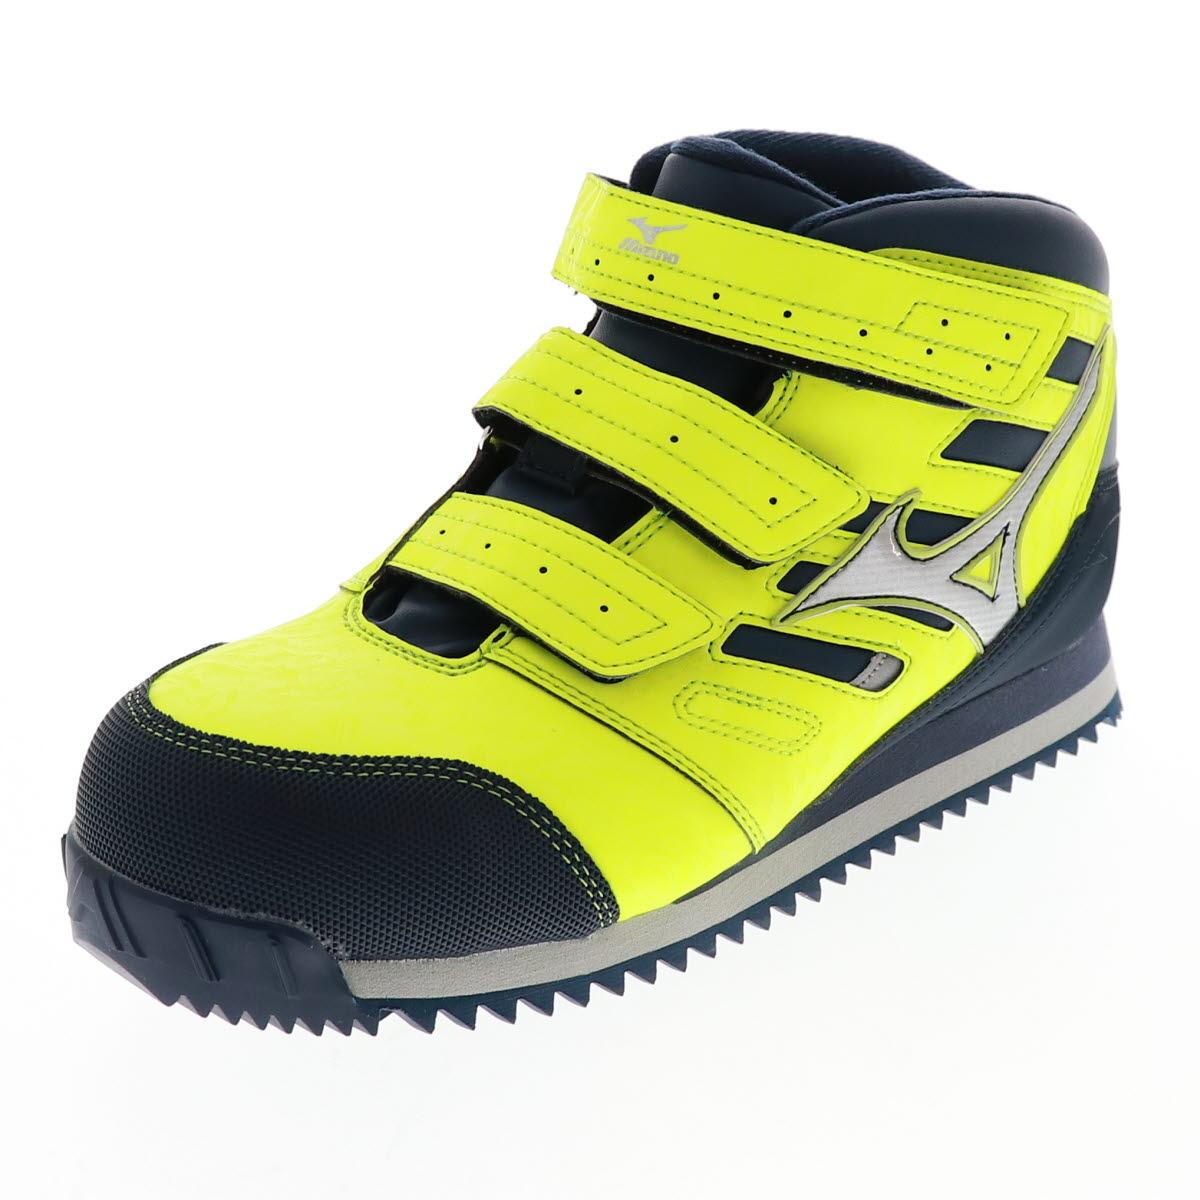 MIZUNO ミズノ 安全靴 メンズ スニーカー 芯入り F1GA180445 ミッドタイプ プロテクティブスニーカー 作業靴 ALMIGHTY WT イエロー×シルバー×ネイビー オールマイテWTMD YE/NV